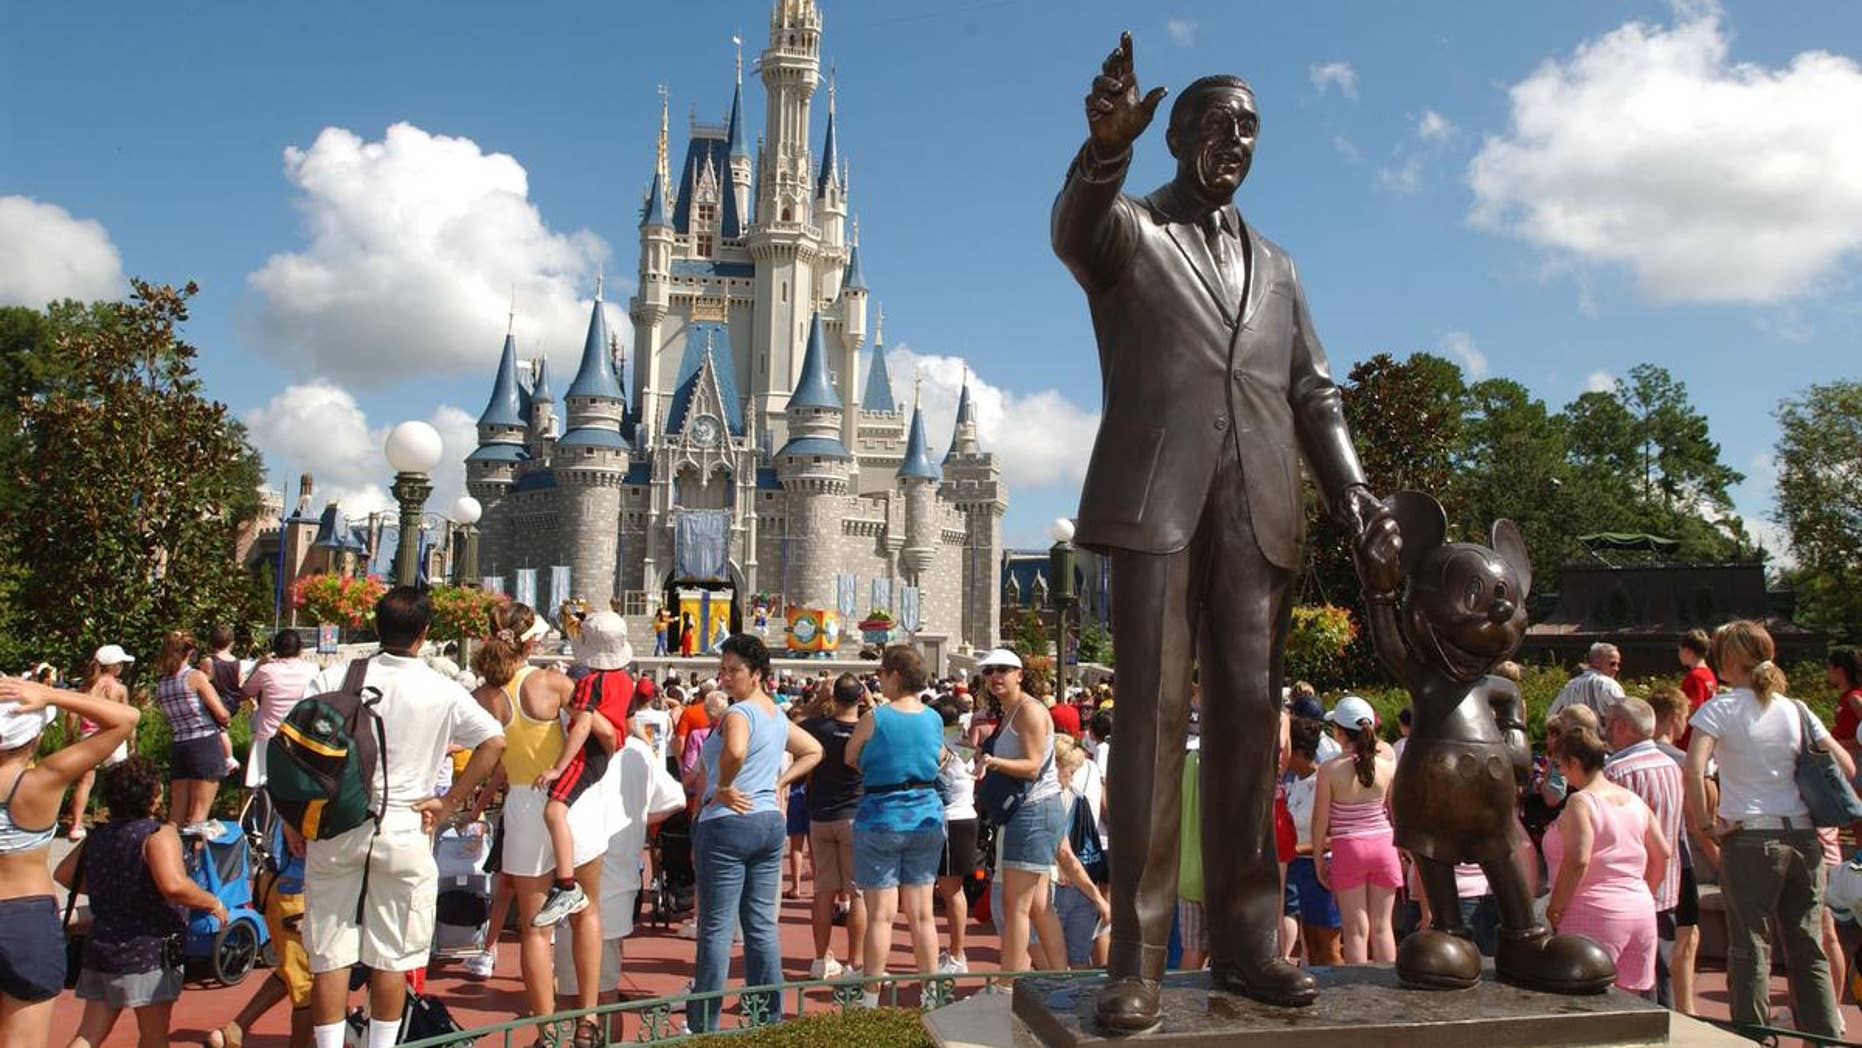 Tourists stop by Cinderella's Castle  performance at Walt Disney World's Magic Kingdom in Lake Buena Vista, Fla.